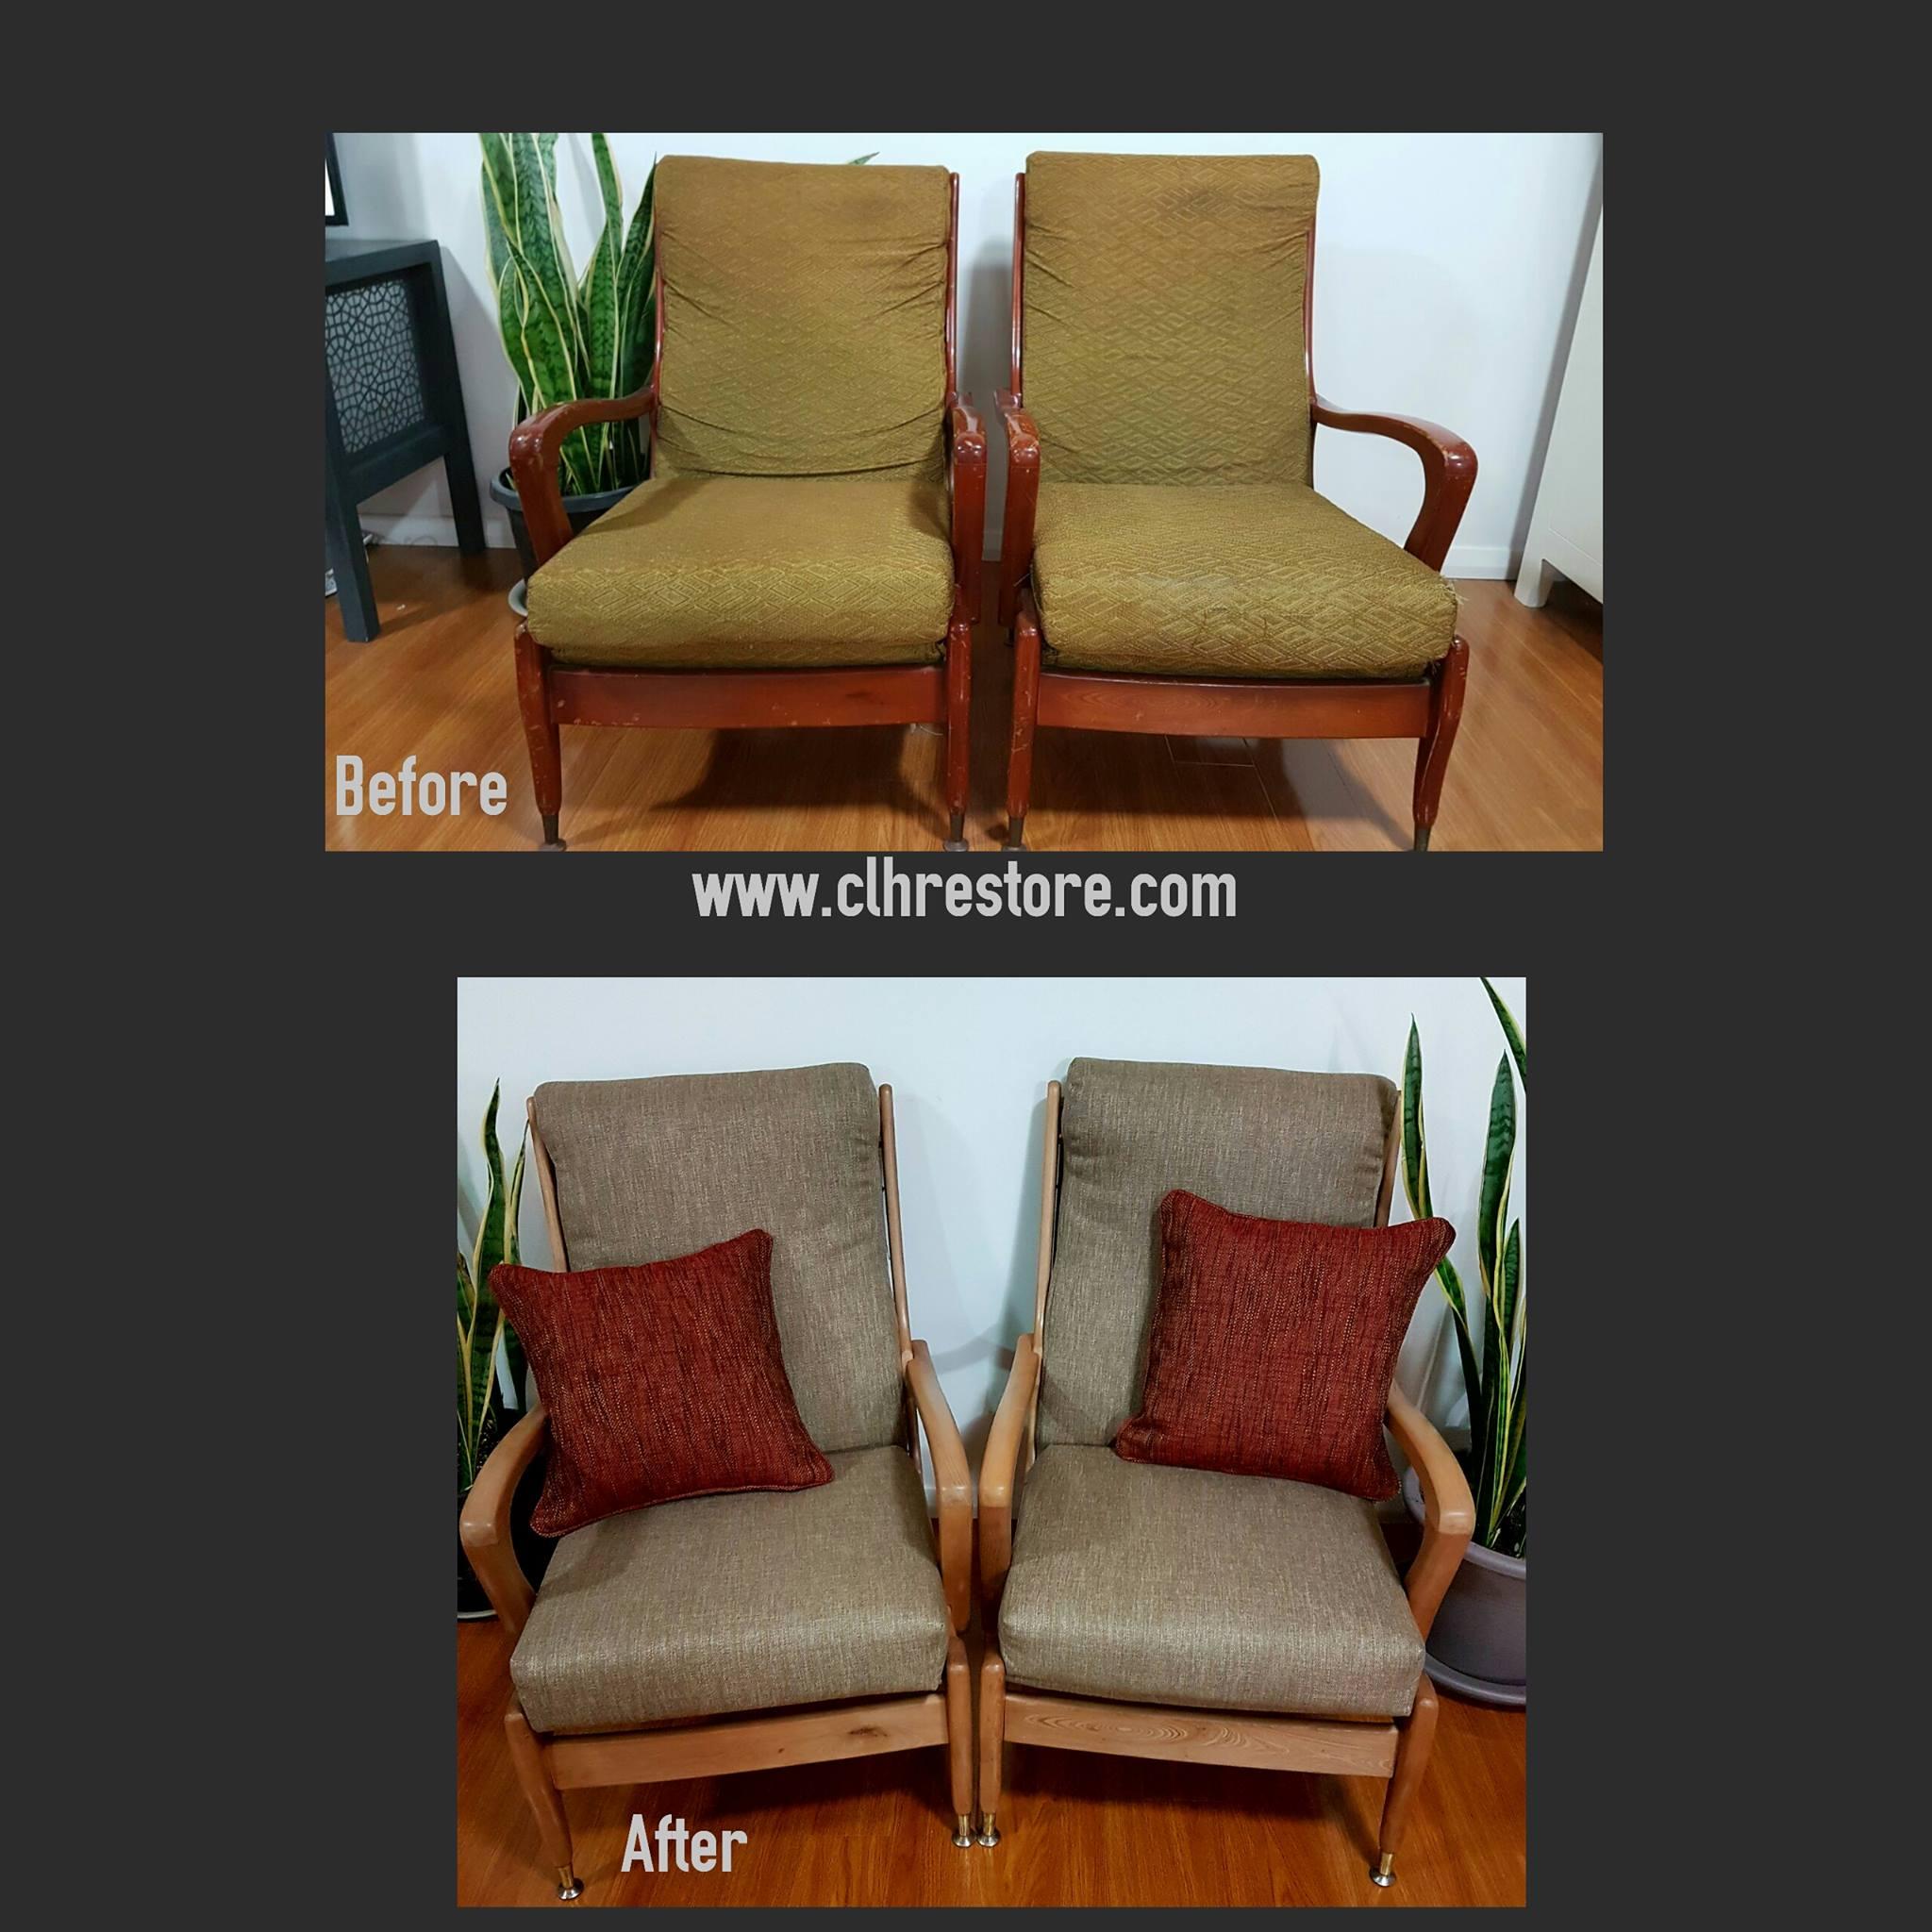 Wrightbilt chairs